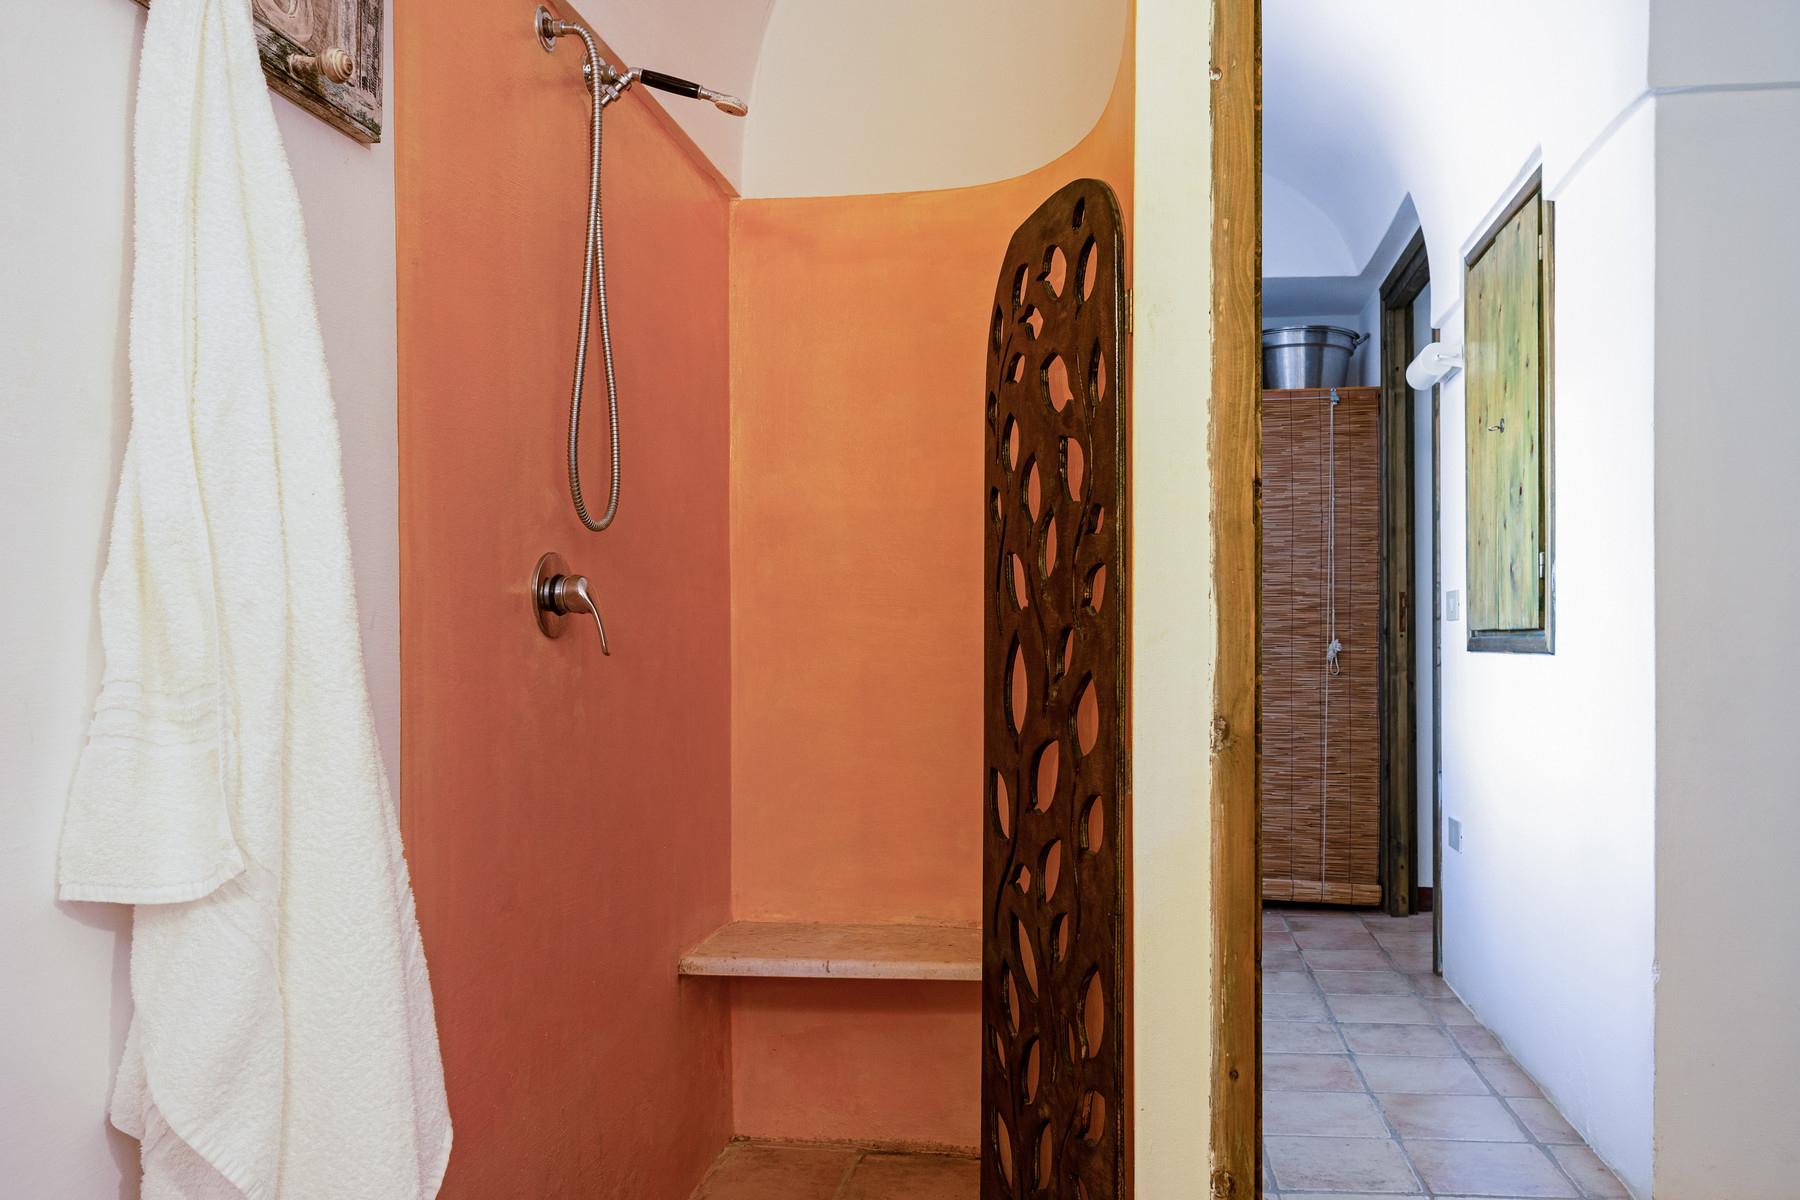 Villa in Vendita a Pantelleria: 5 locali, 82 mq - Foto 9